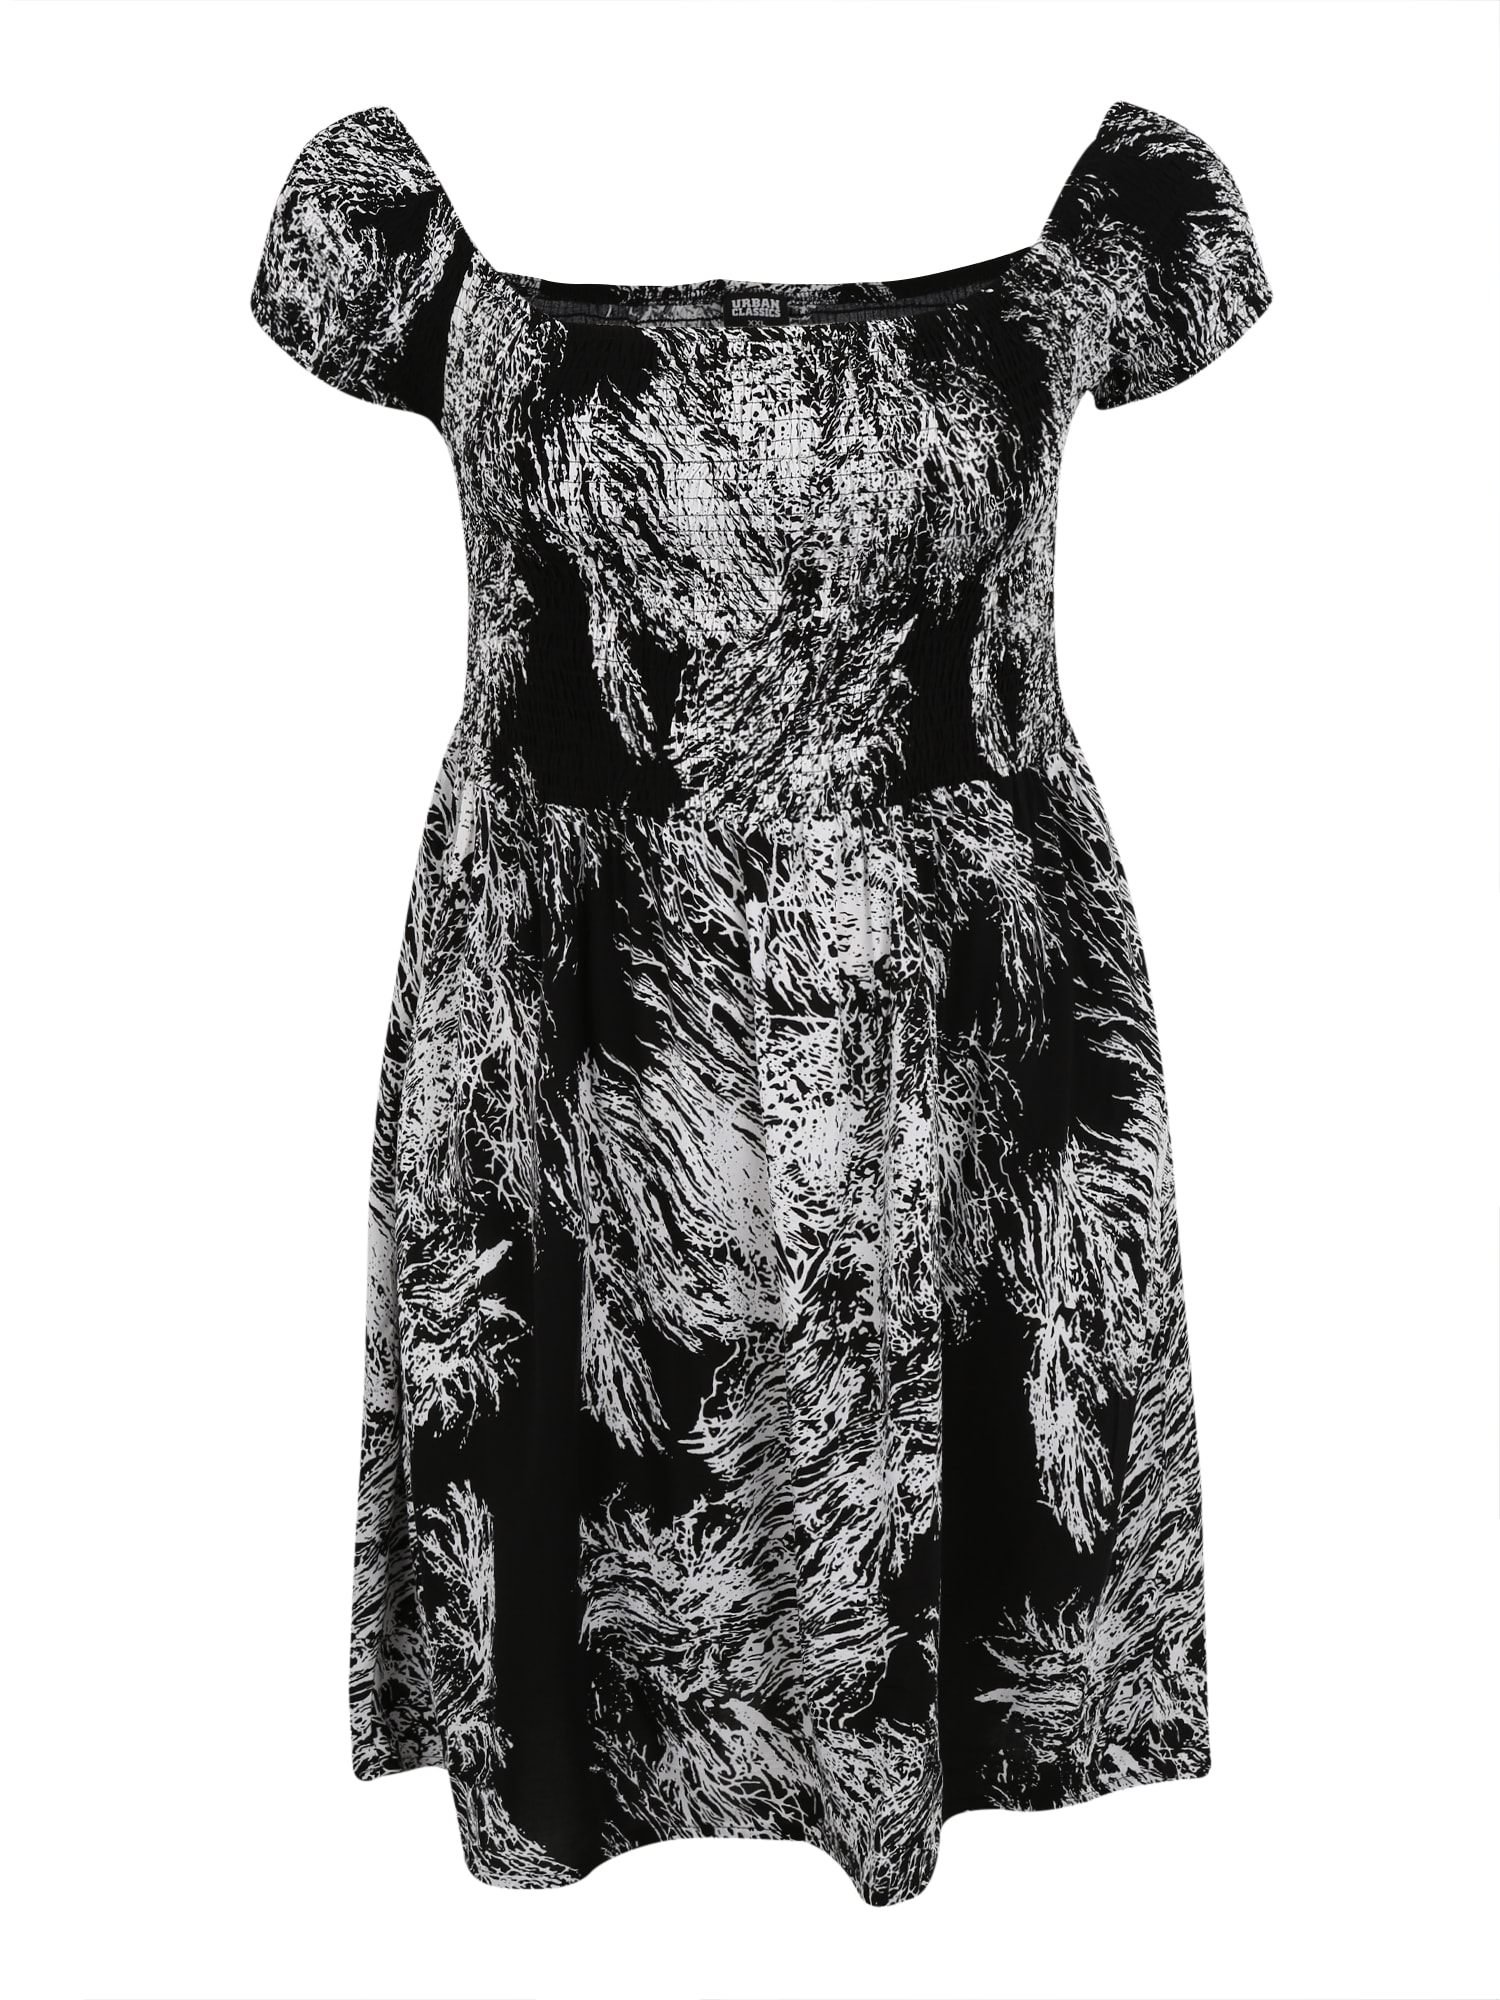 Šaty Smoked černá bílá Urban Classics Curvy